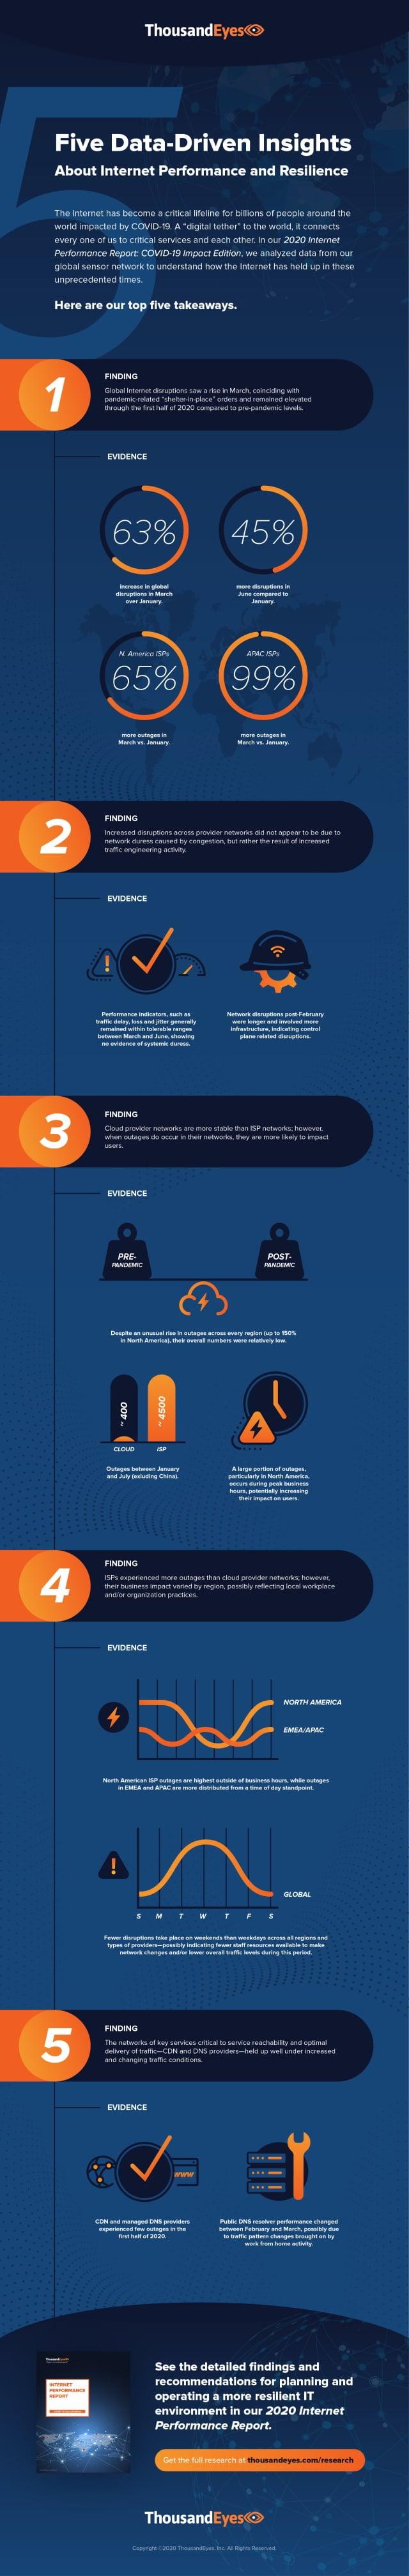 ThousandEyes infographic